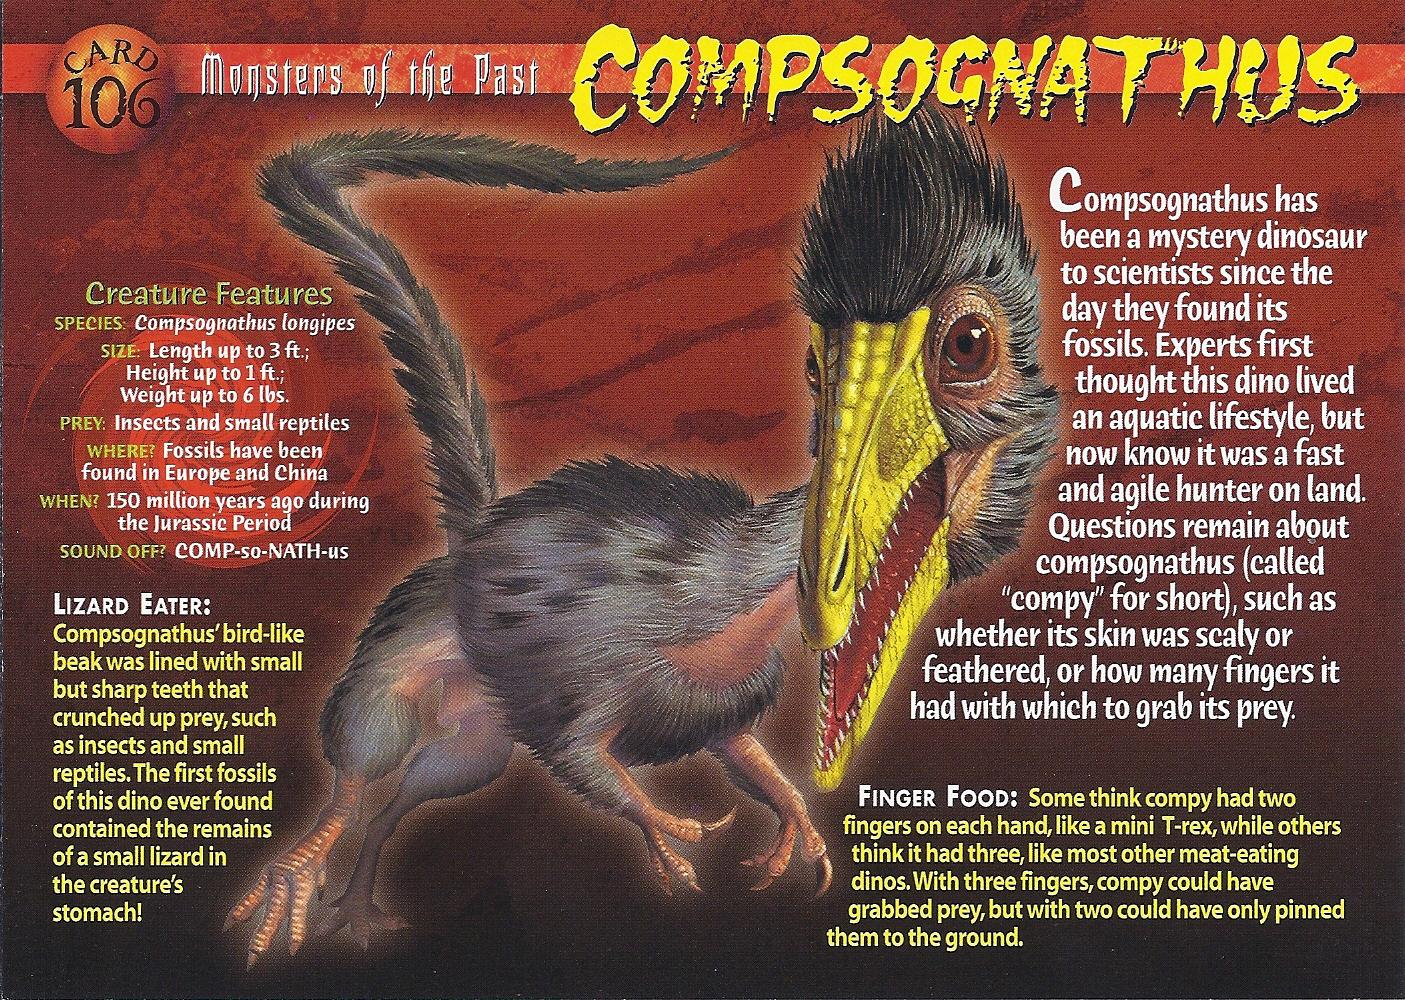 http://vignette3.wikia.nocookie.net/wierdnwildcreatures/images/4/45/Compsognathus_front.jpg/revision/latest?cb=20130828020914